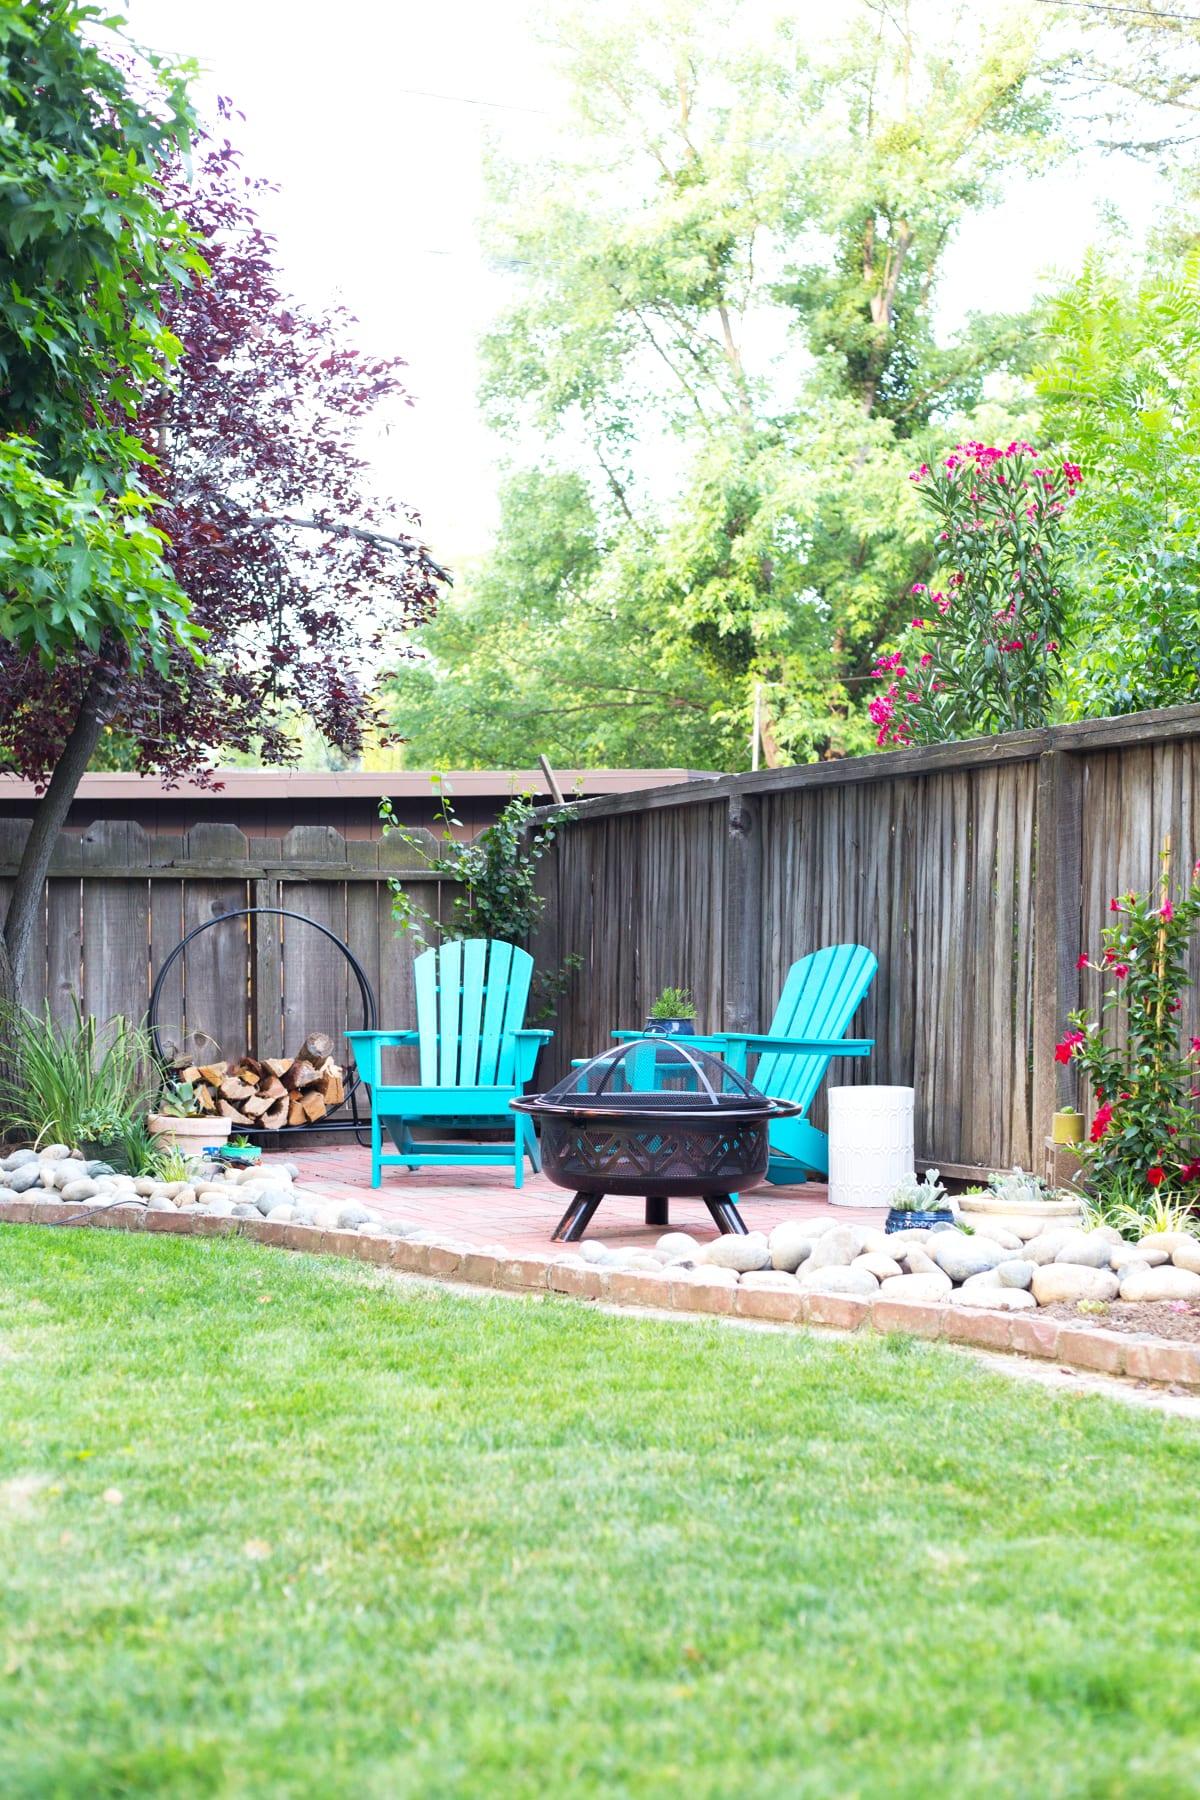 DIY Backyard Patio | Lovely Indeed on Small Patio Design Ideas  id=46230